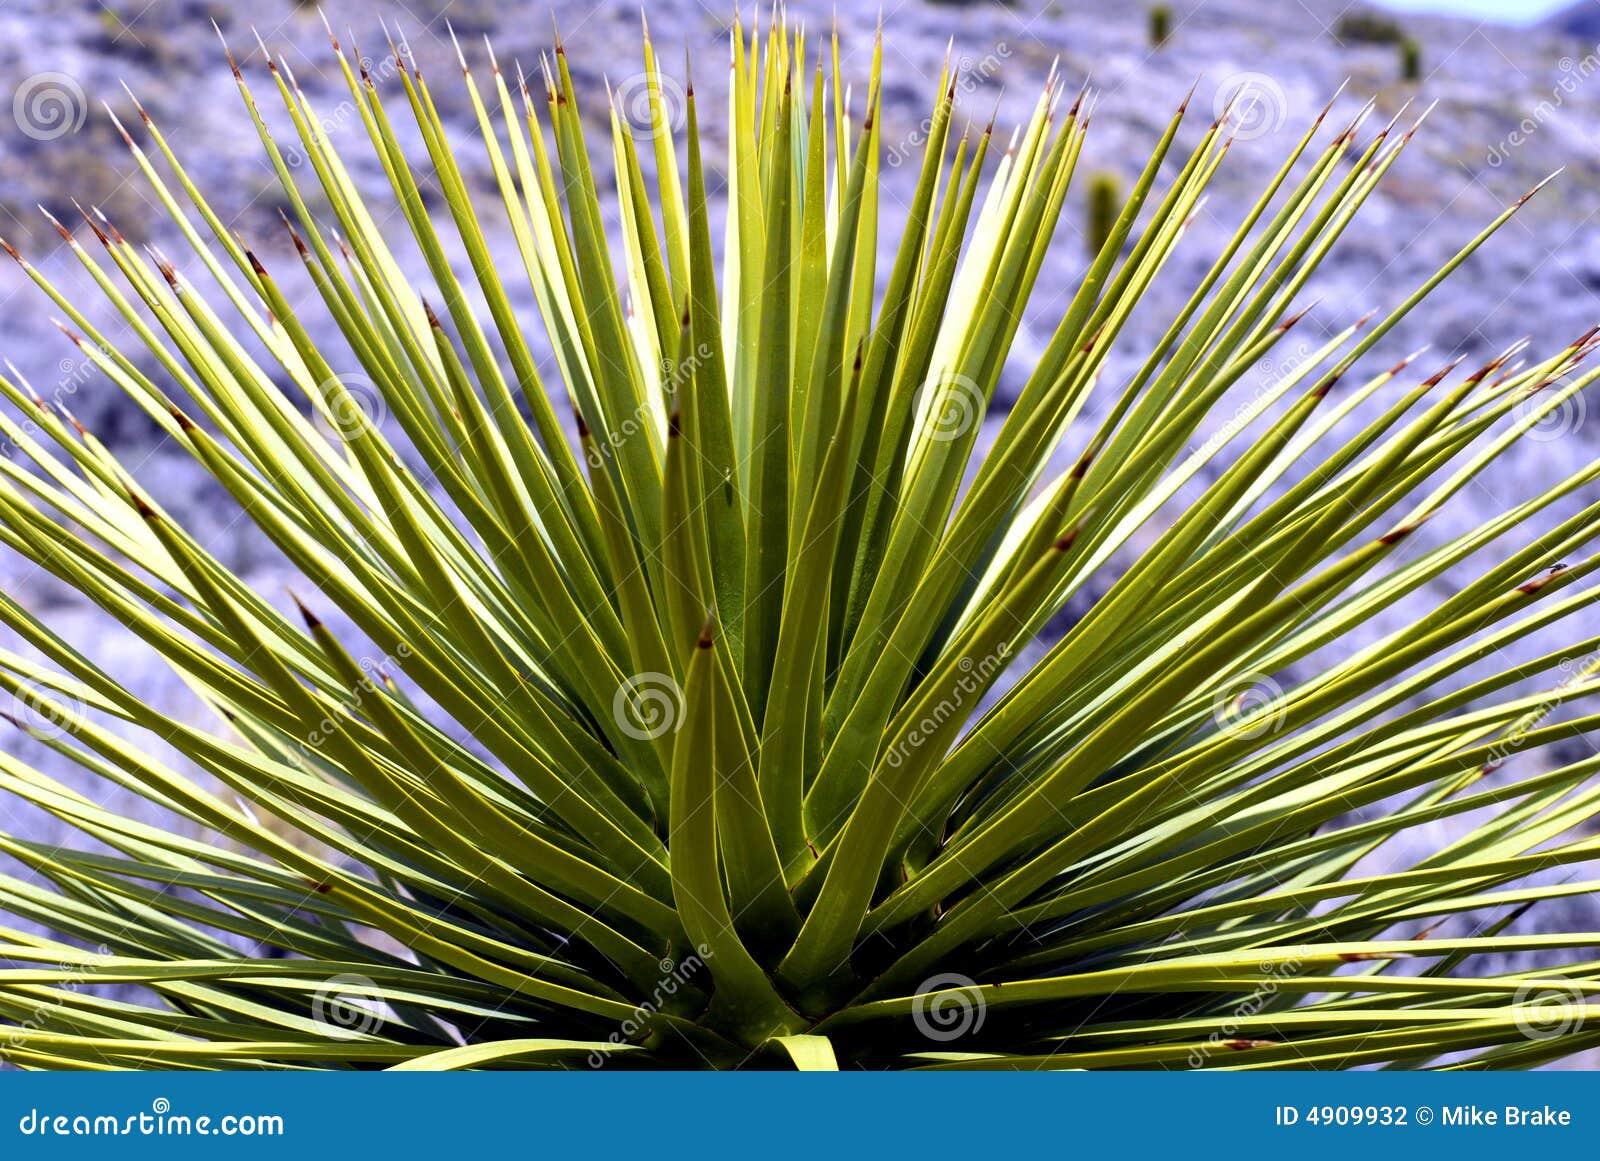 Yucca plant images 3